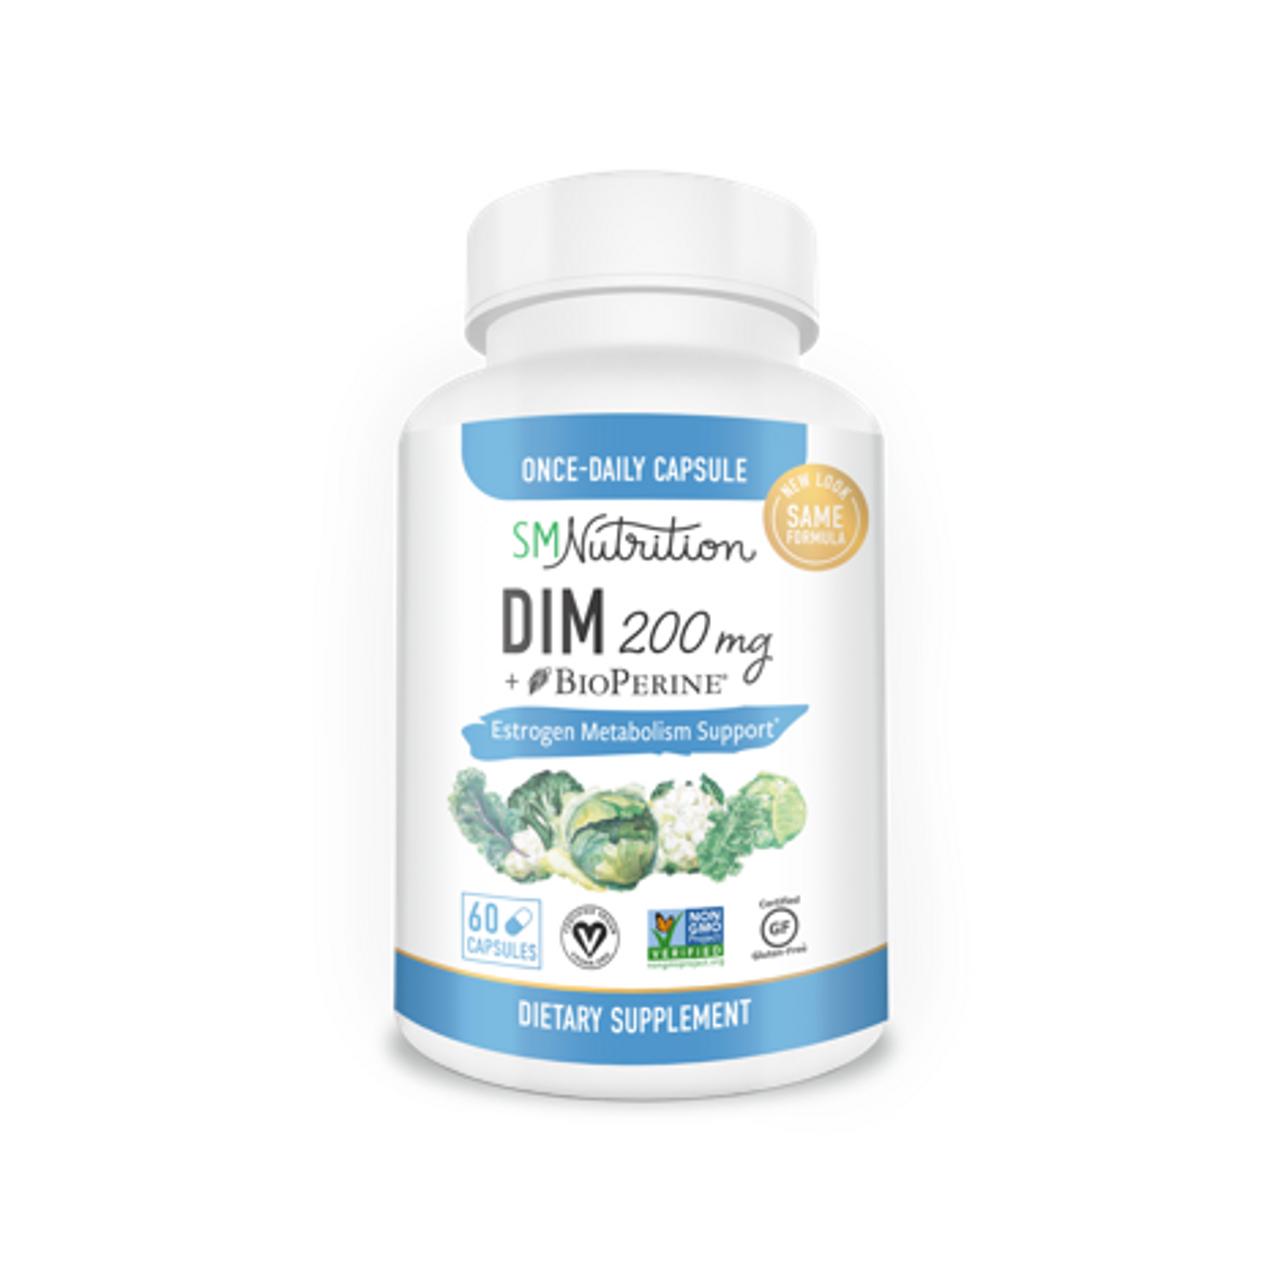 DIM 200mg with BioPerine, 60 Capsules